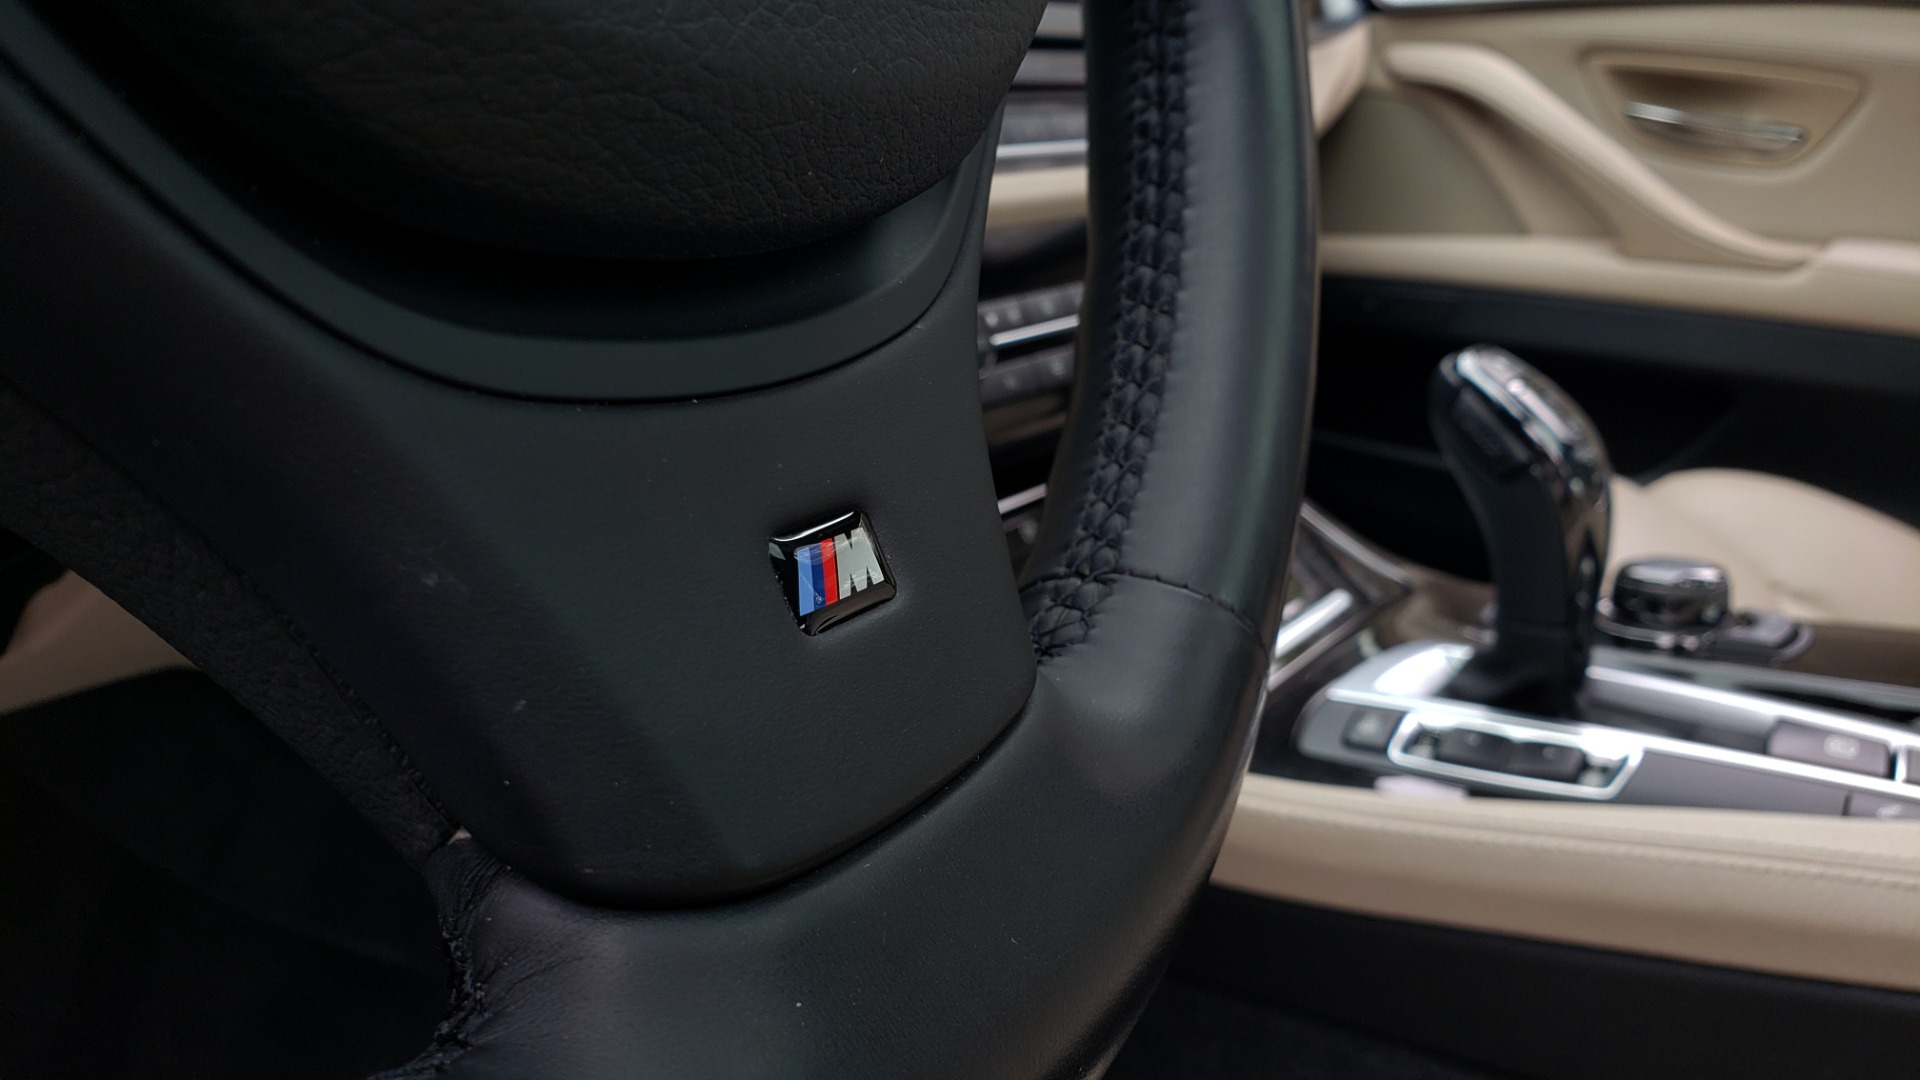 Used 2012 BMW 5 SERIES 550I M SPORT / NAV / CONV PKG / SUNROOF / PREM SND / REARVIEW for sale Sold at Formula Imports in Charlotte NC 28227 33